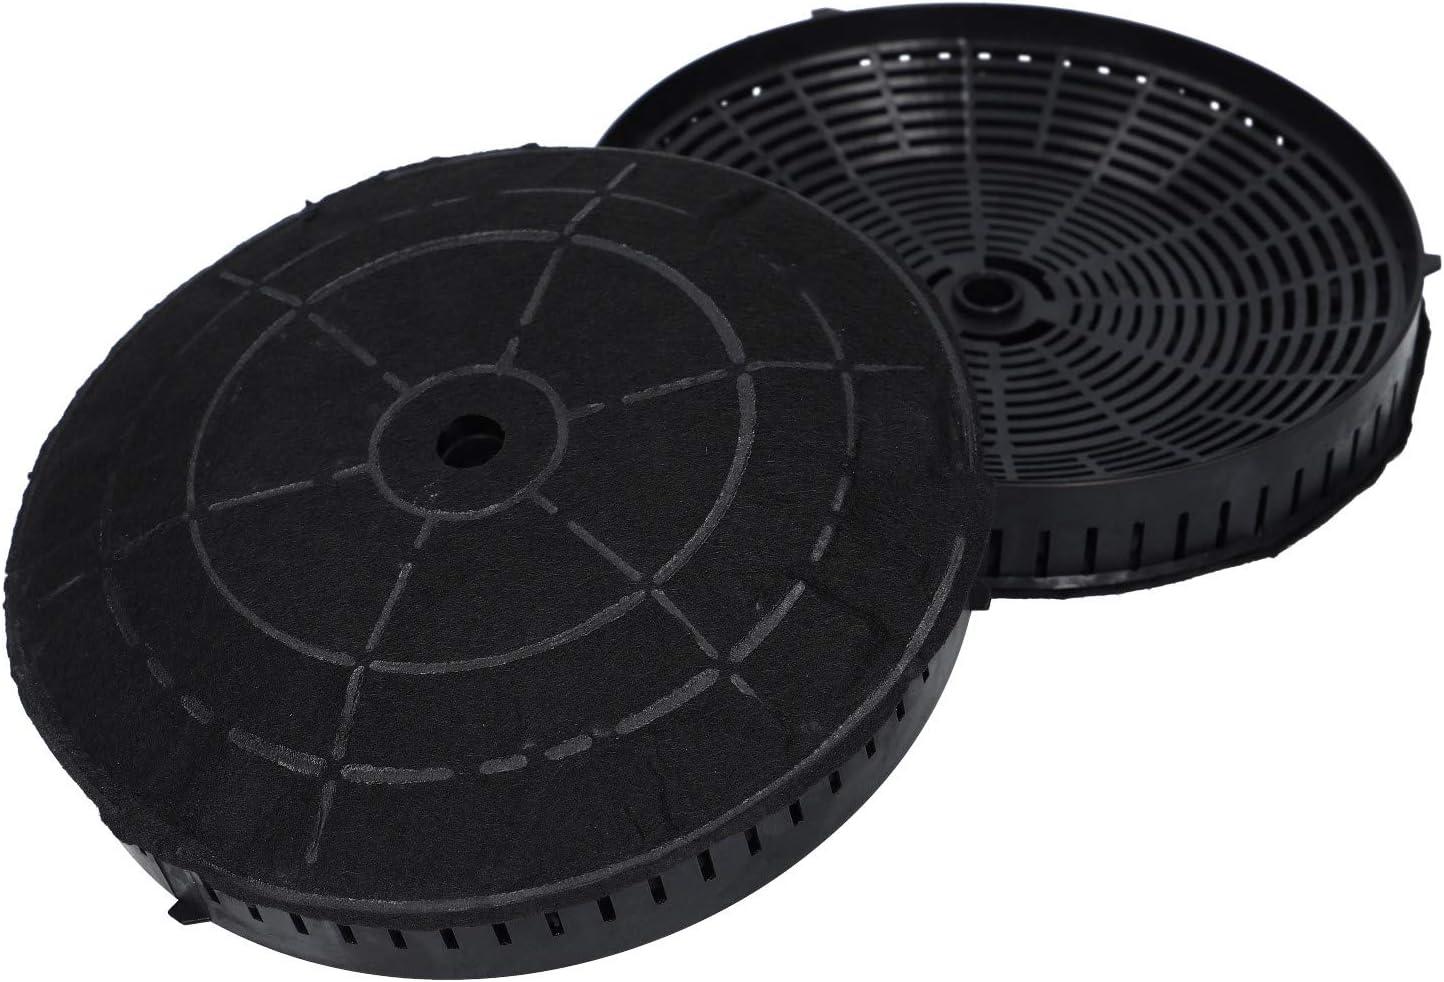 2 x filtro de carbón activado para Whirlpool 484000008824 Ikea Nyttig FIL 440 Elica CFC0038668 campana extractora